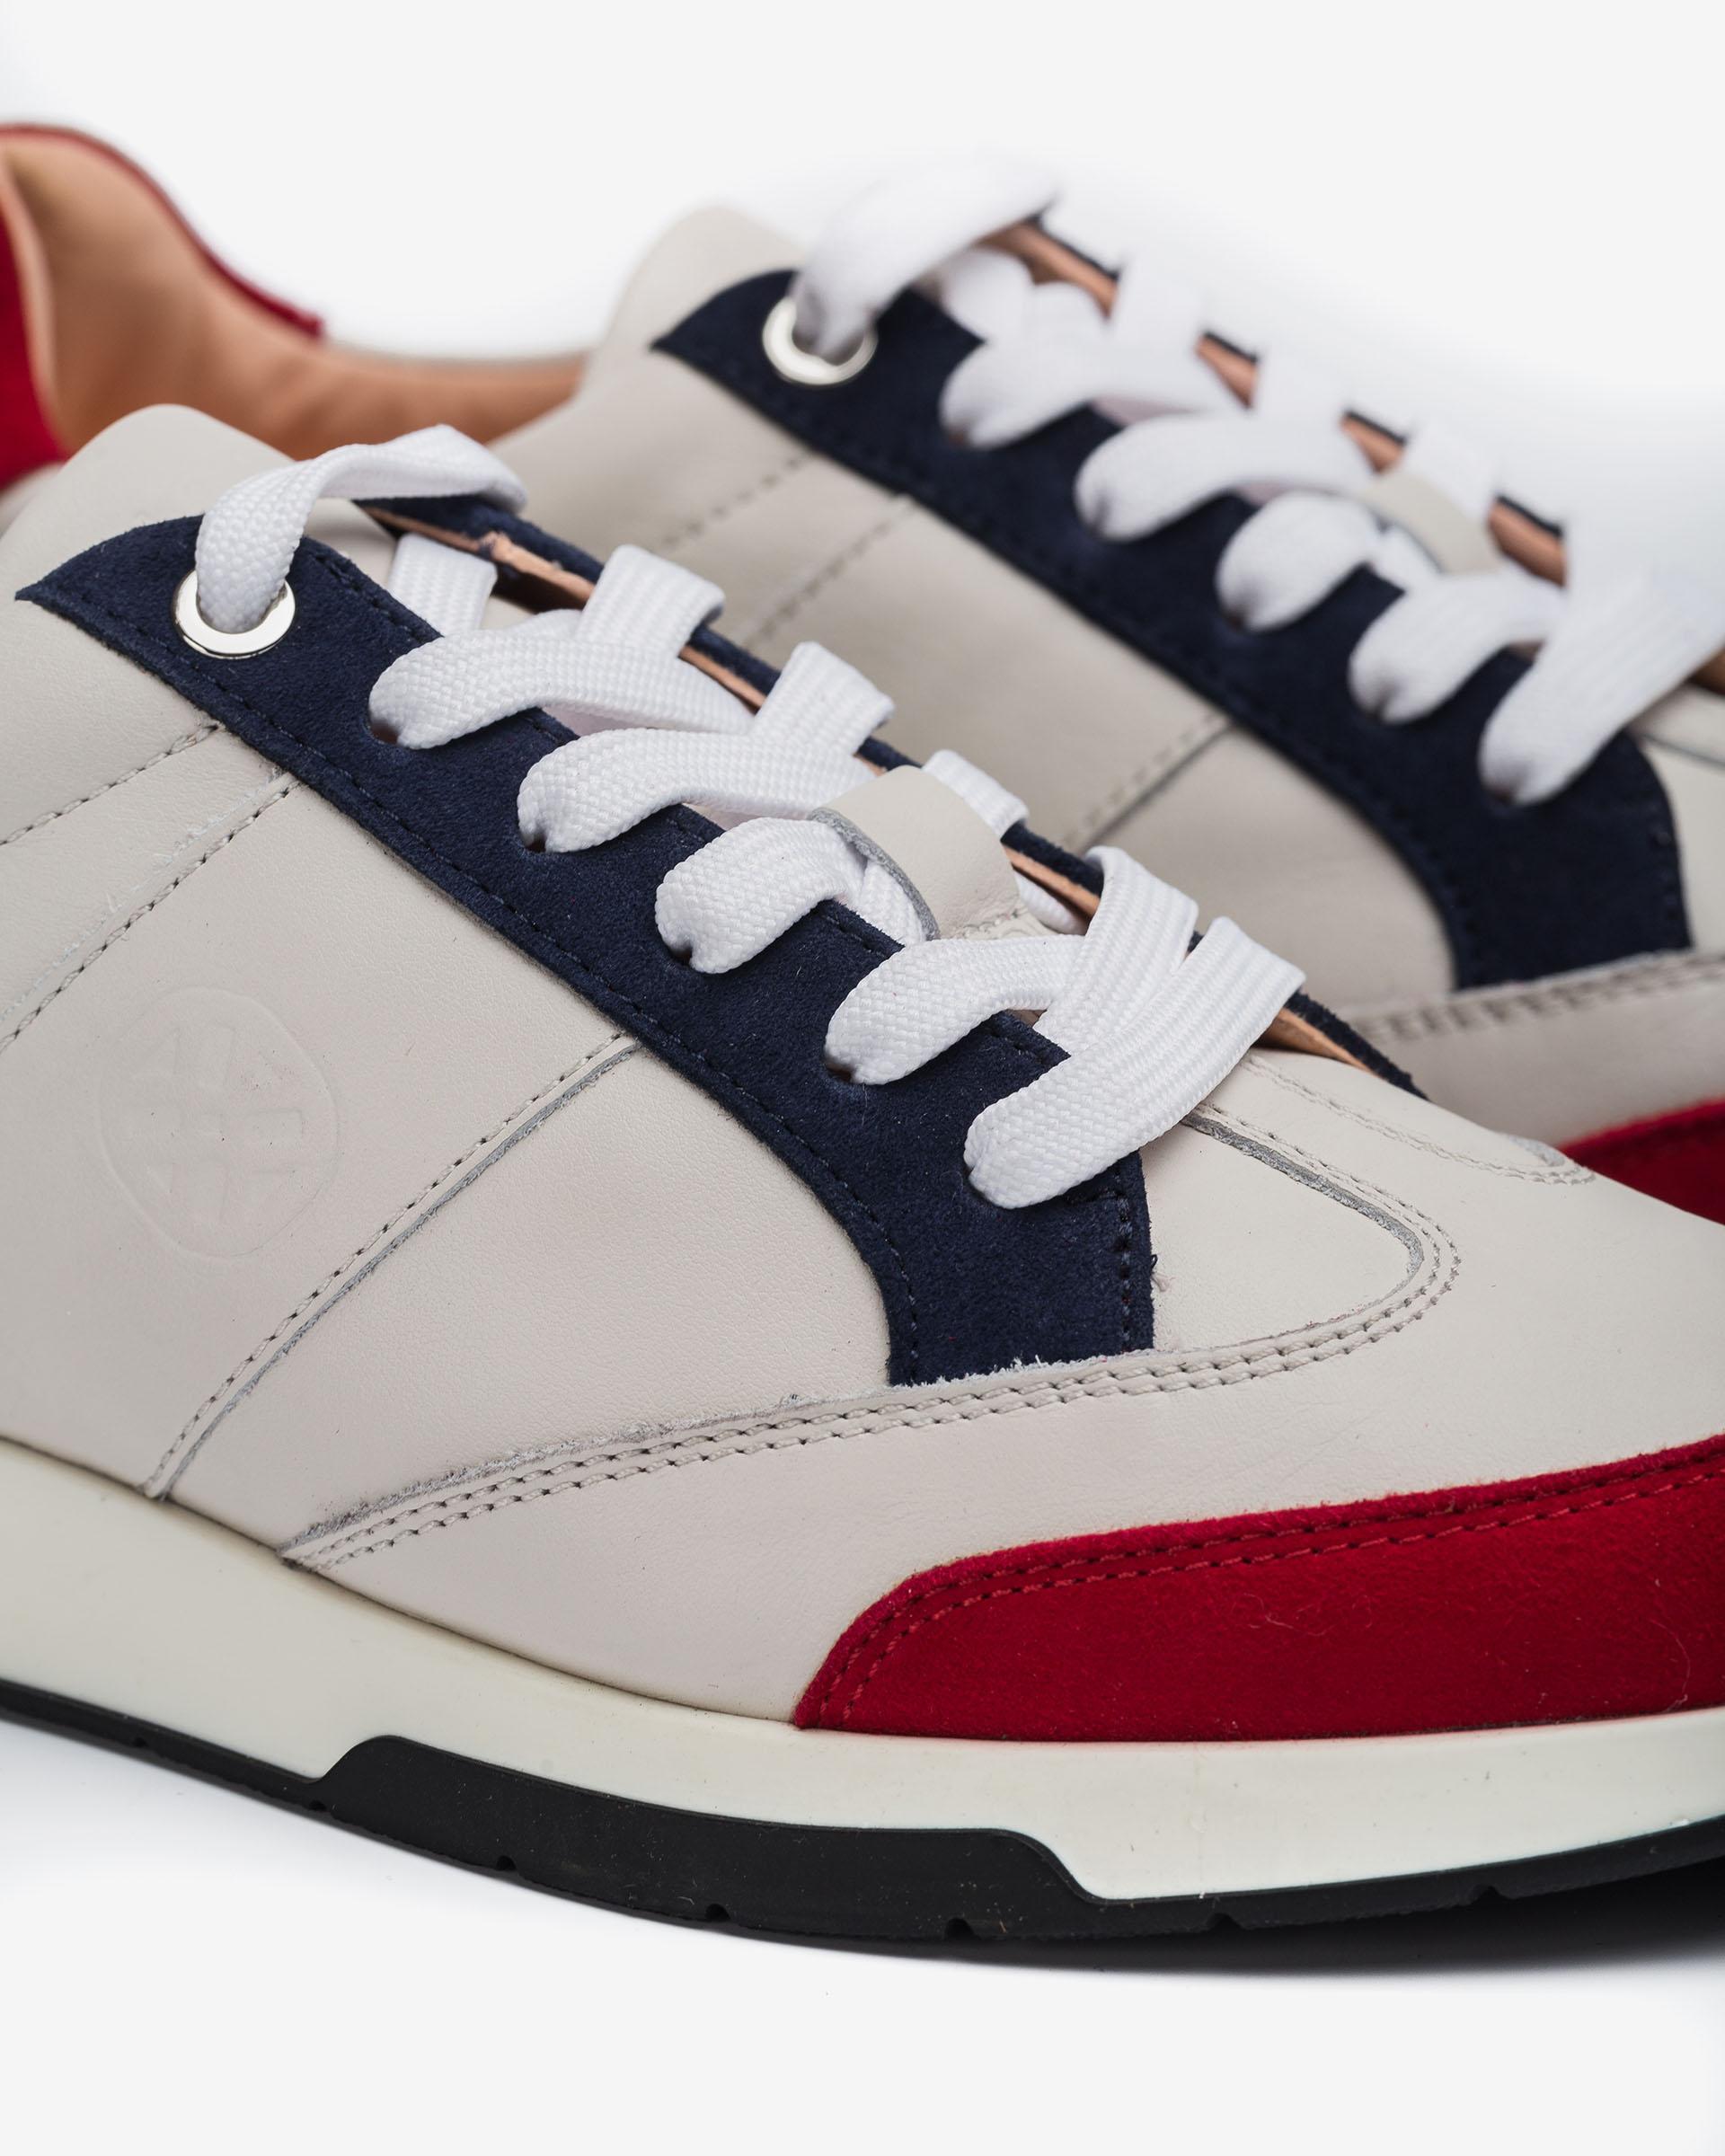 UNISA Sneaker mit Monogramm FALCONI_21_NF_KS 5